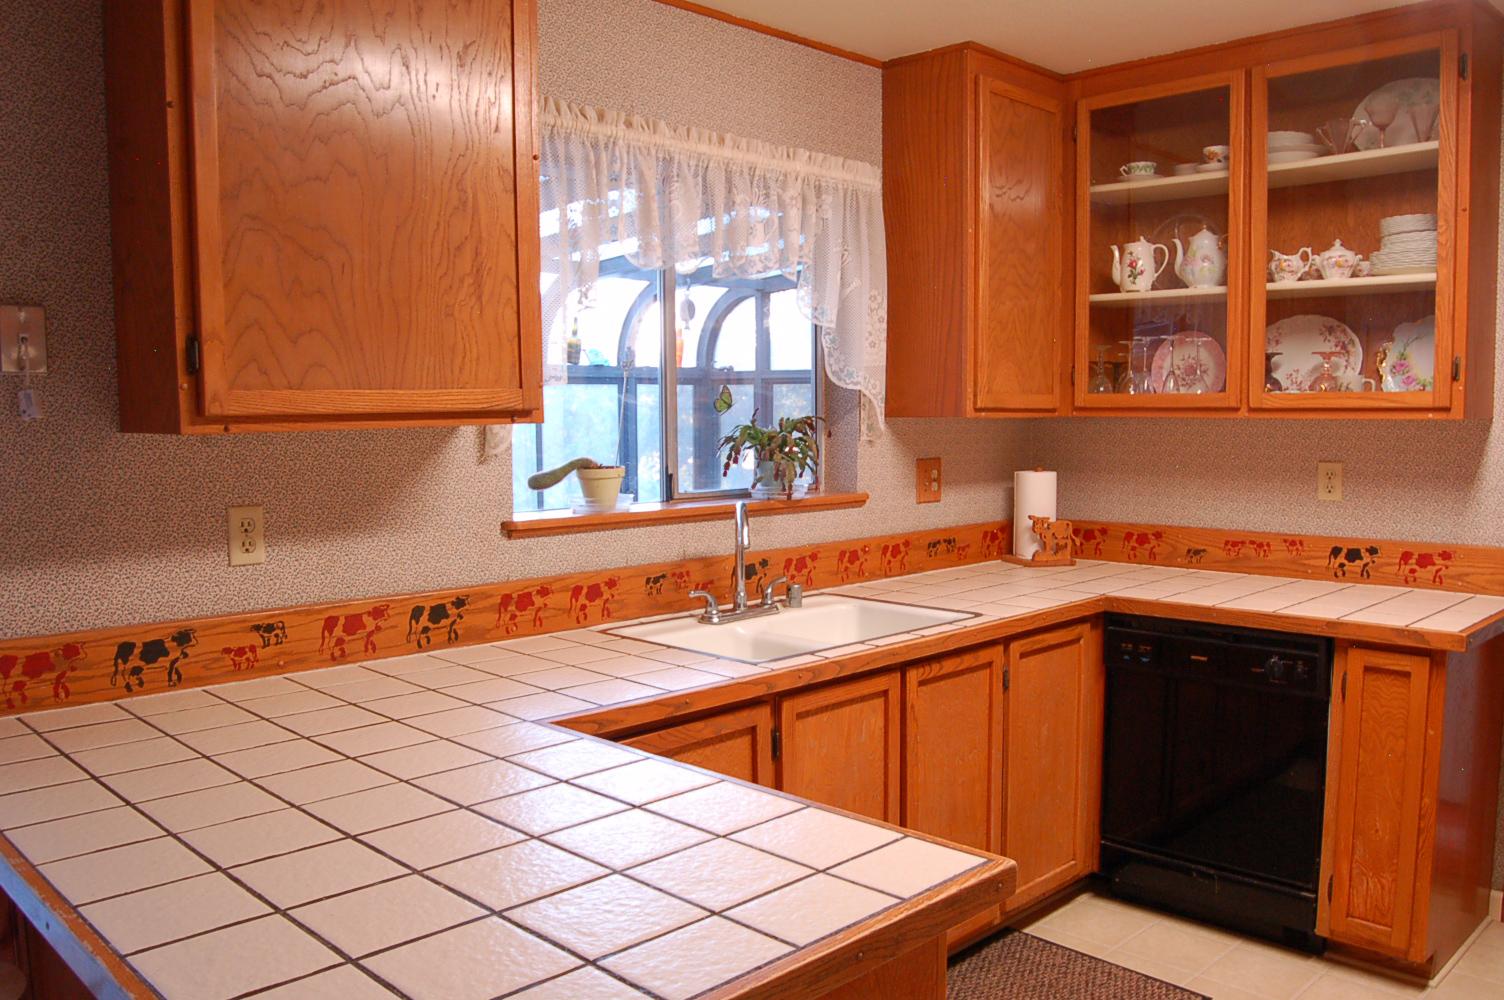 17410-Hooker-Creek-Rd-Cottonwood-CA-kitchen